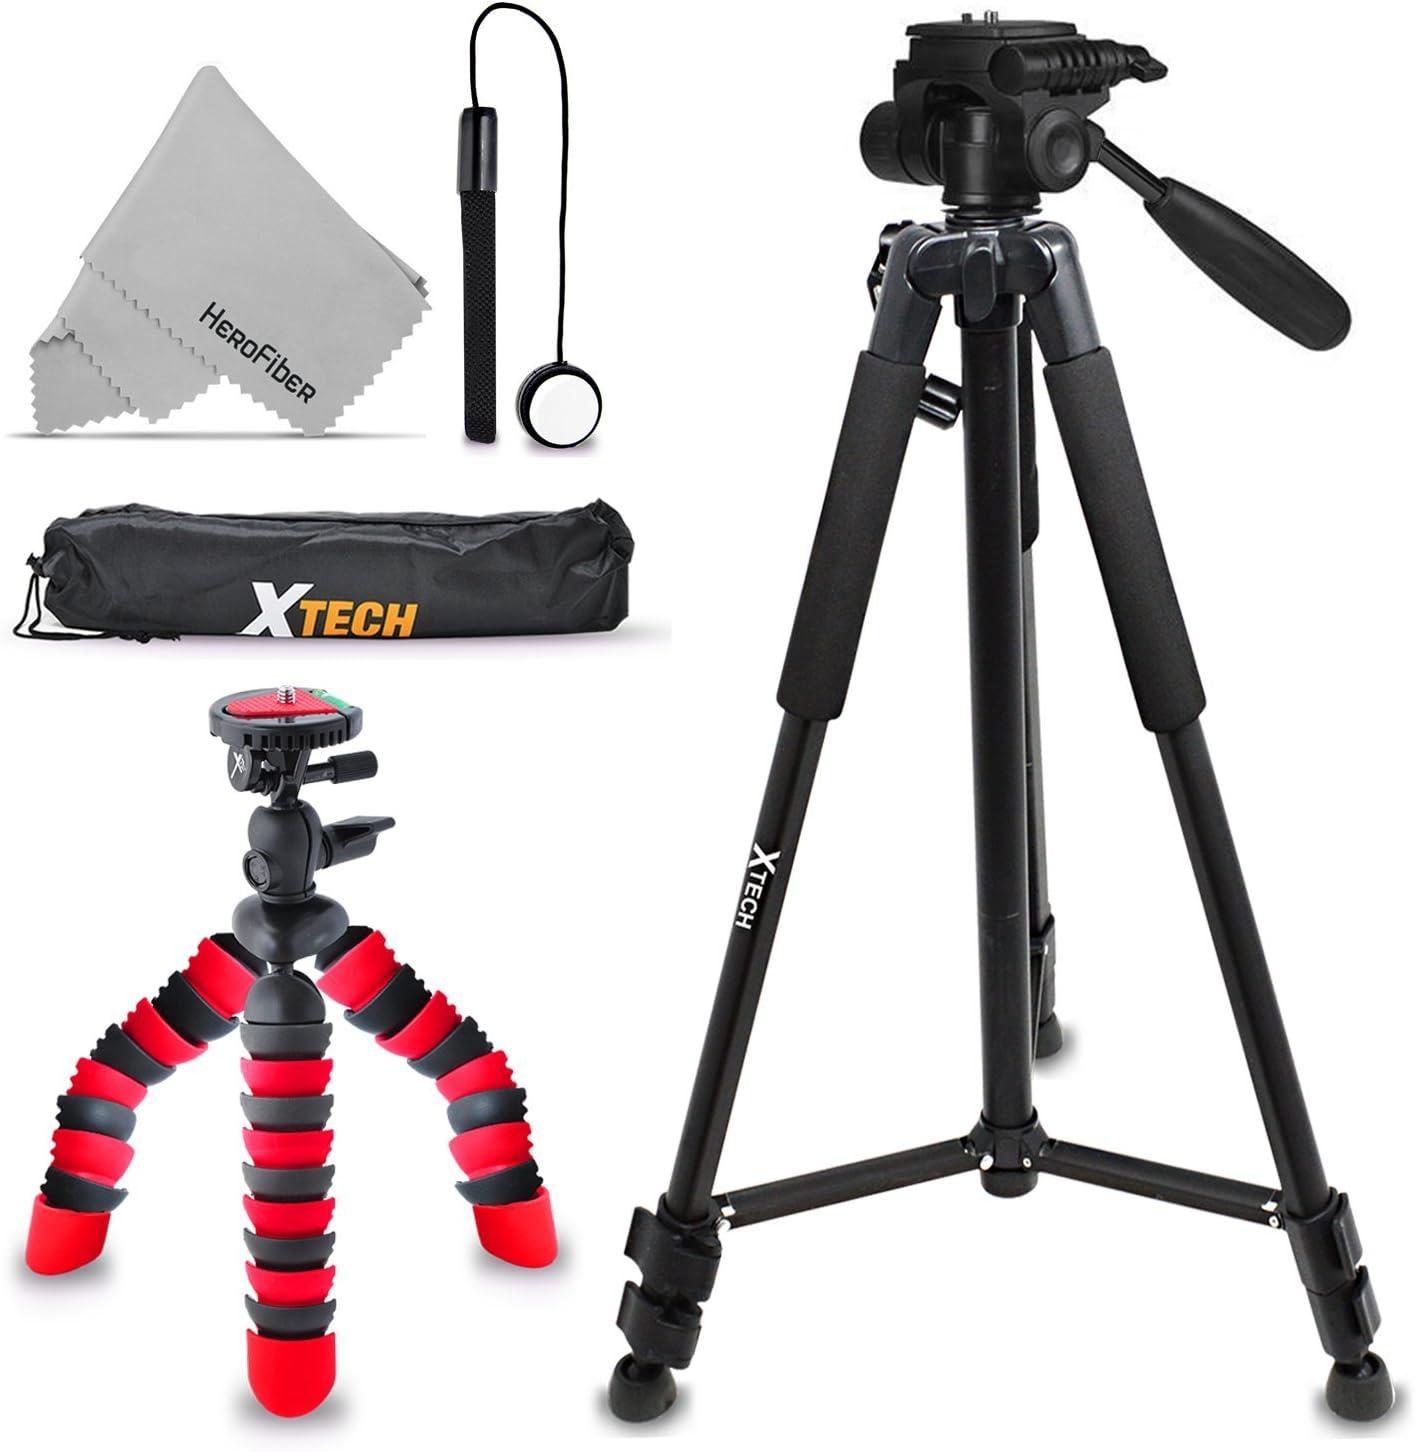 "Xtech Double Tripod Kit with 72"" Inch Tripod + 12"" Flexible Tripod for Canon Powershot SX730 HS, SX620 HS, SX720 HS, SX710 HS, SX610 HS, G9 X Mark II, G7 X Mark II, SX540 HS, SX42"